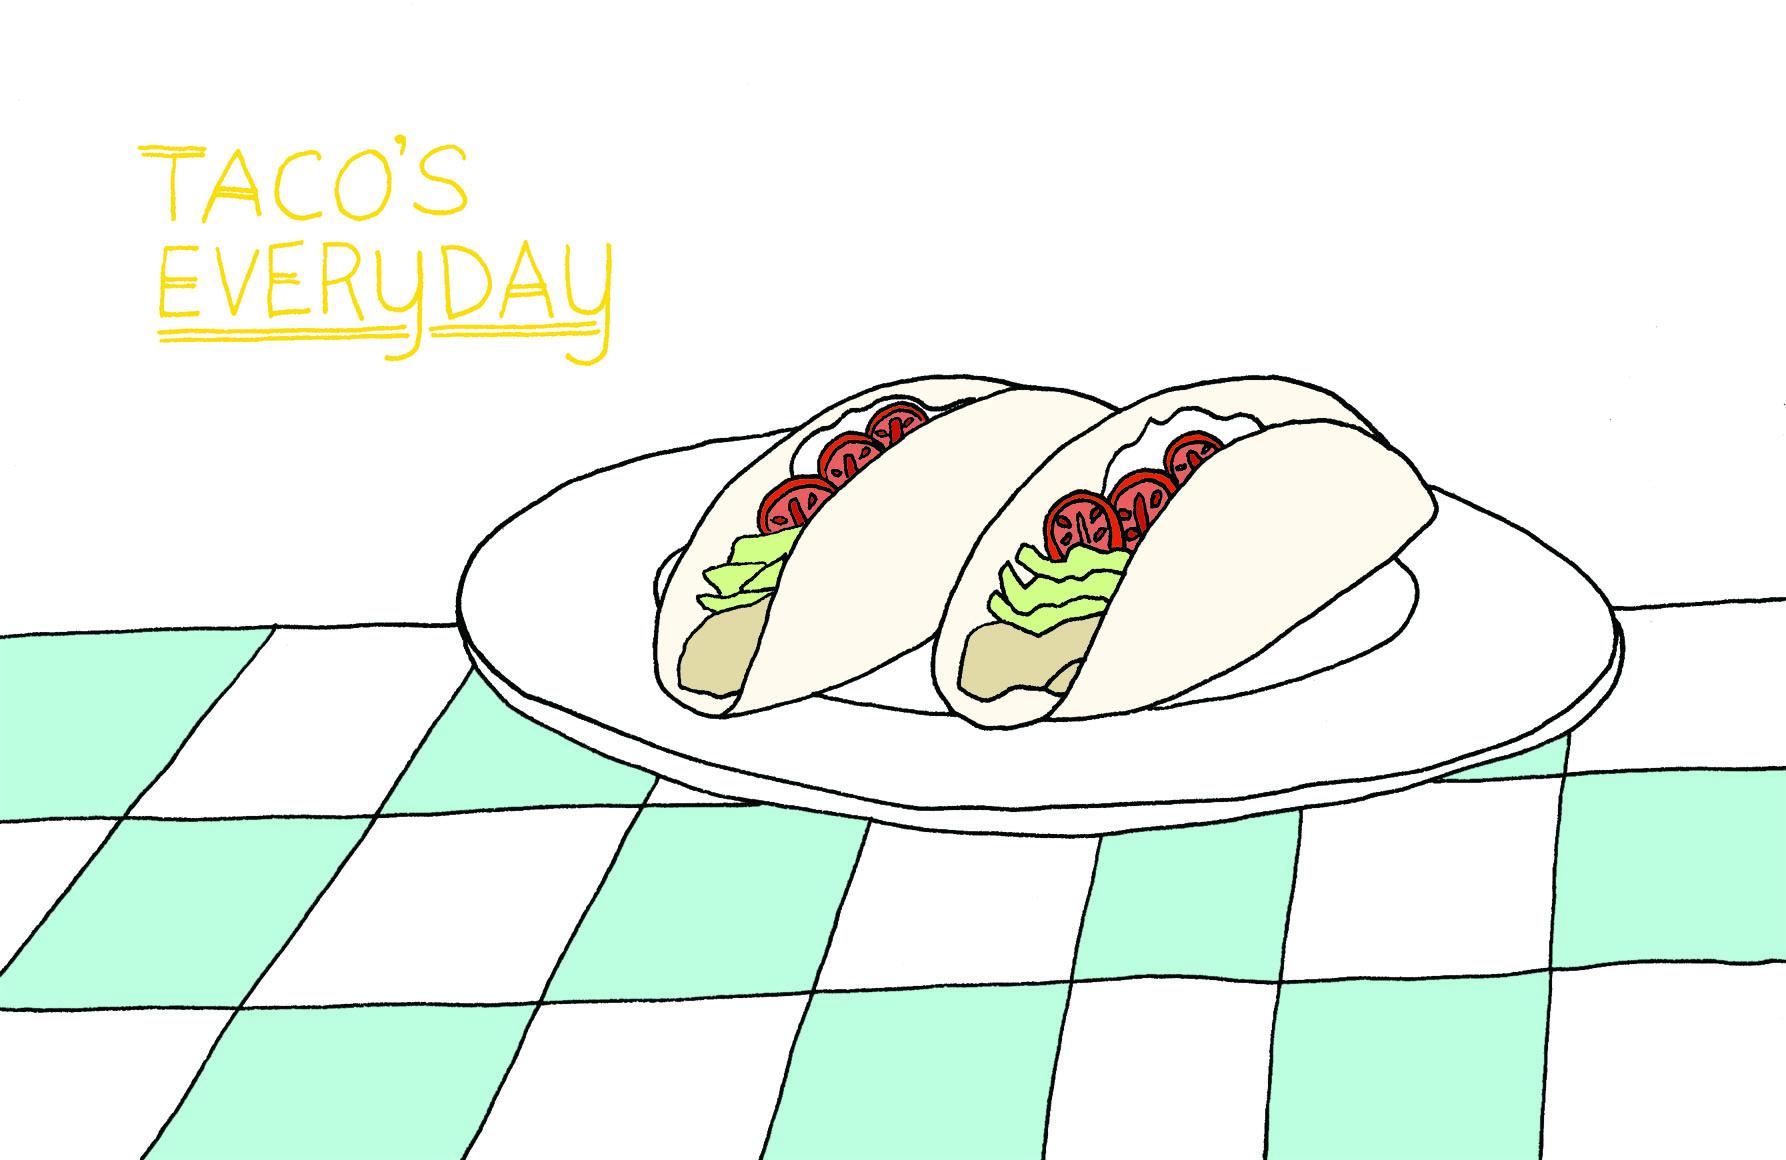 tacos_everyday.jpg